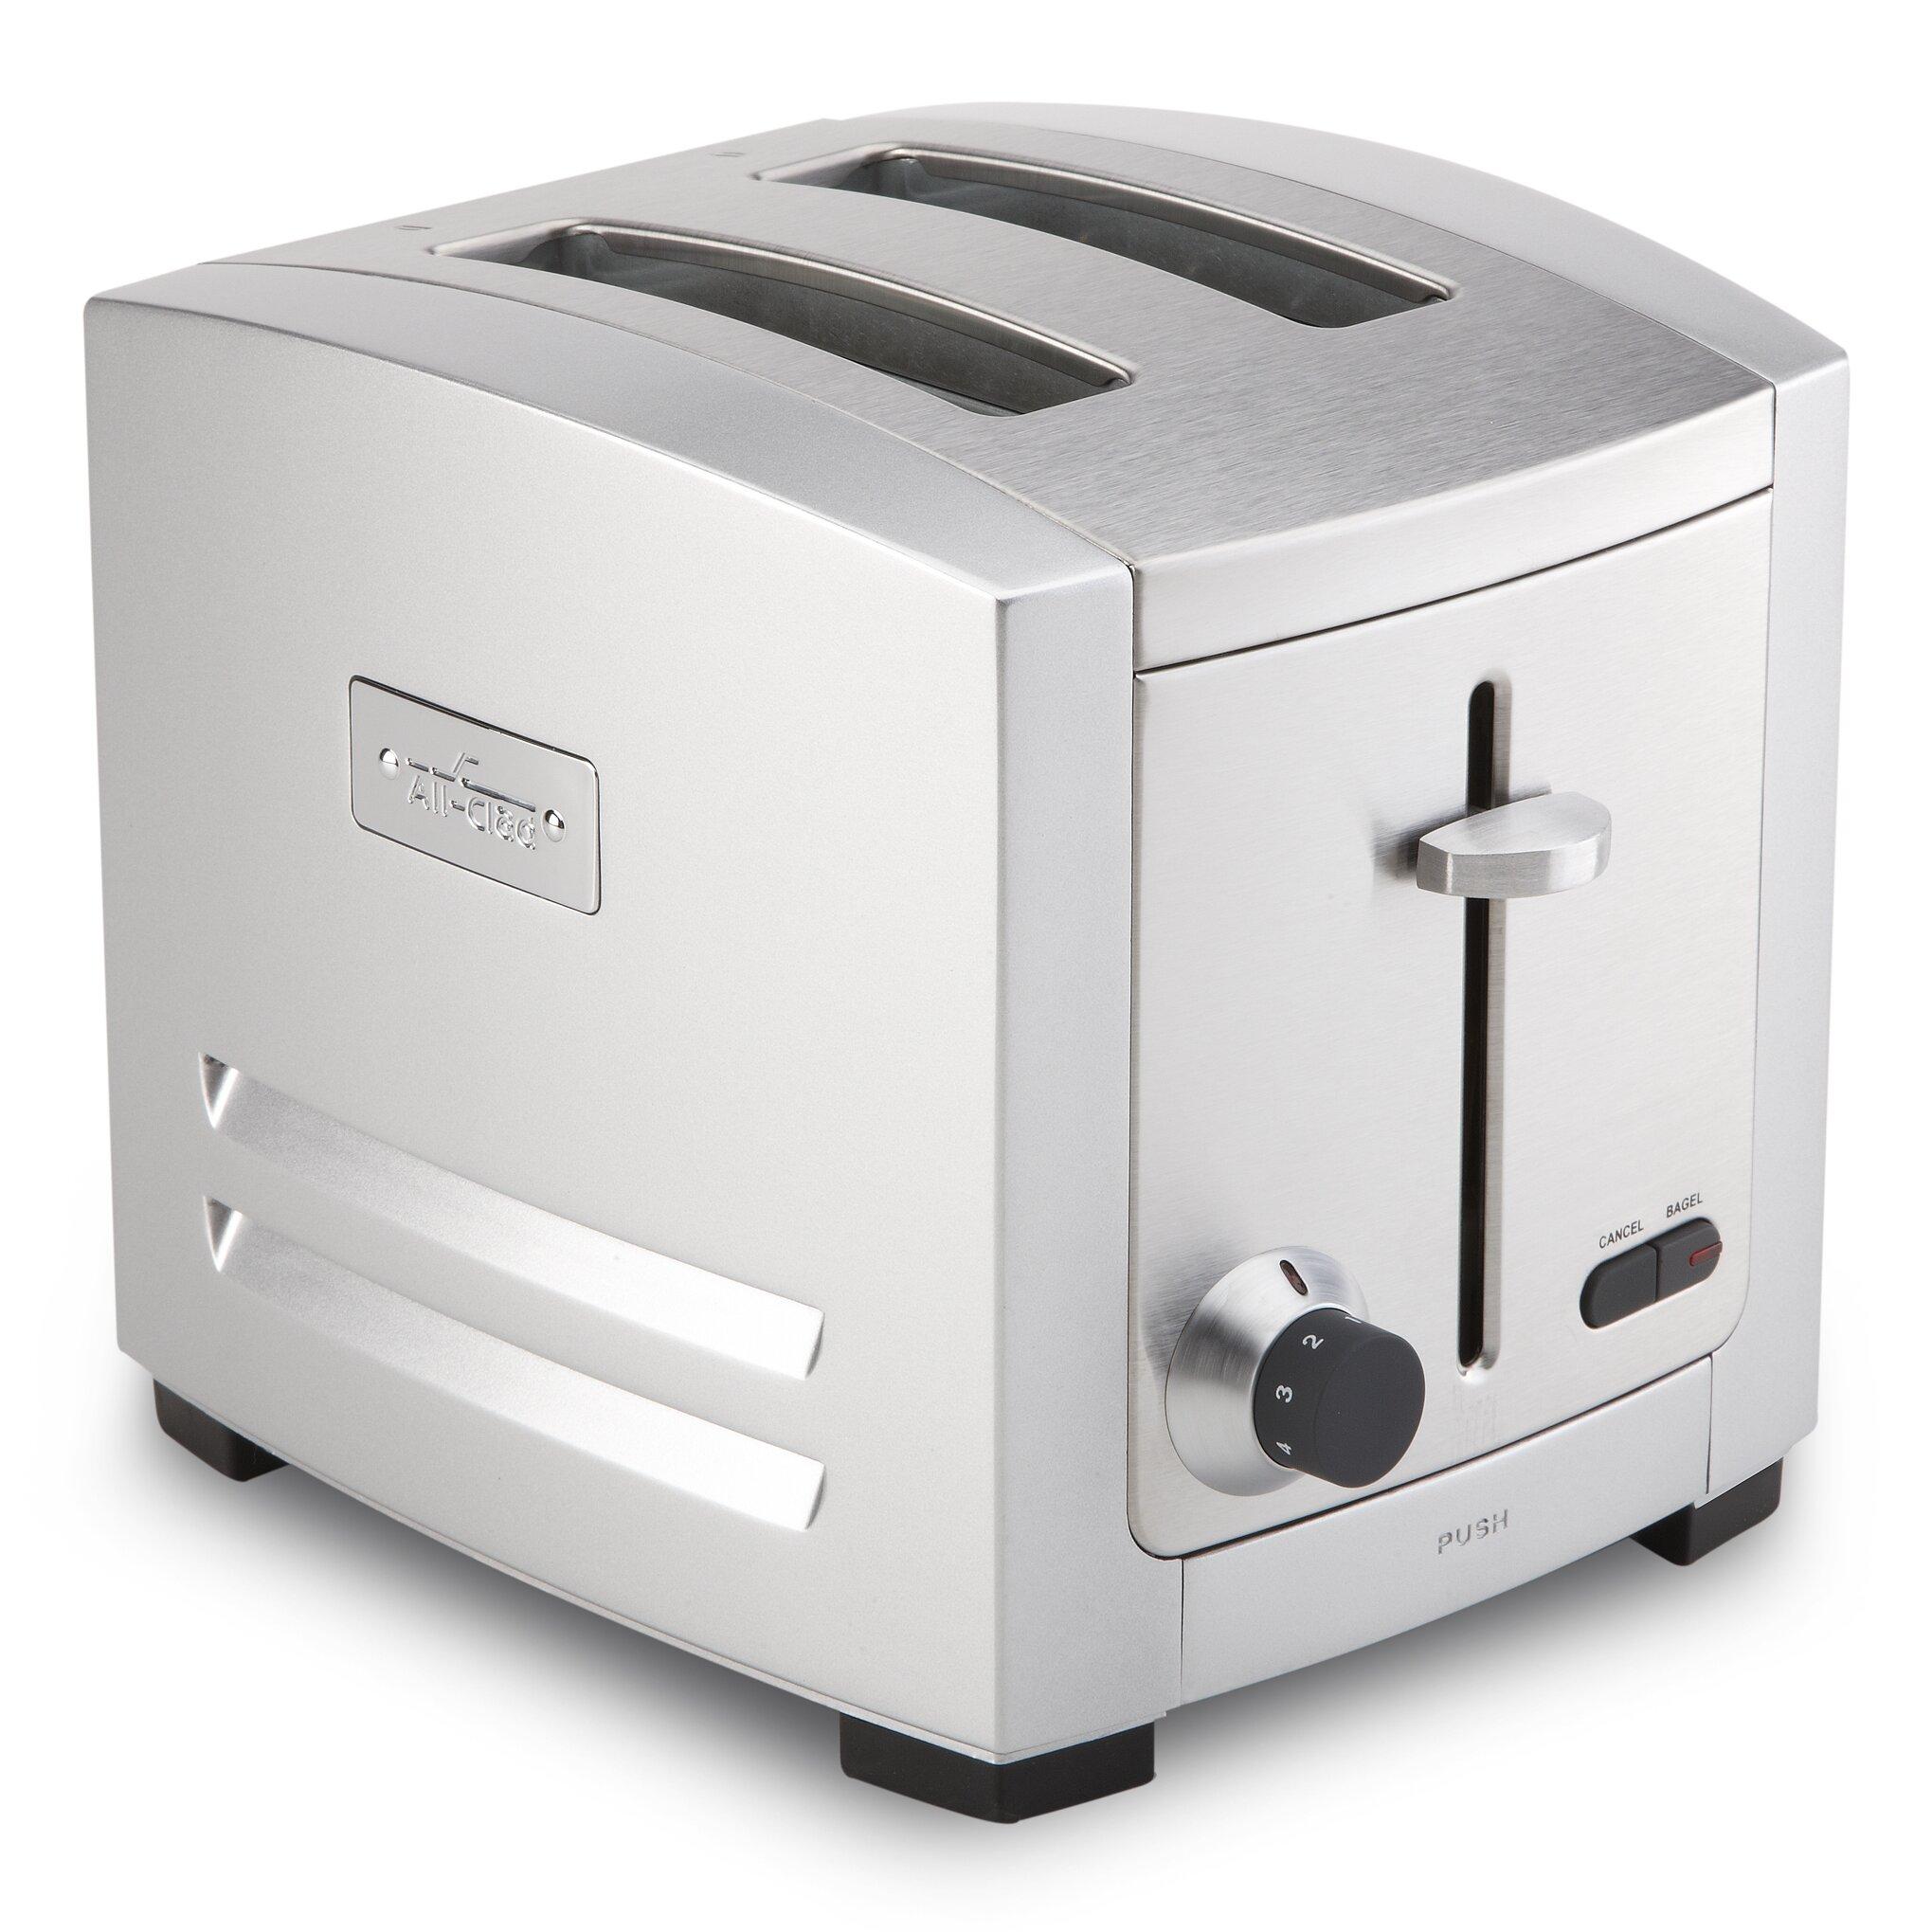 White Clad Ice Box Original All Clad Electrics Slice Toaster Tjd